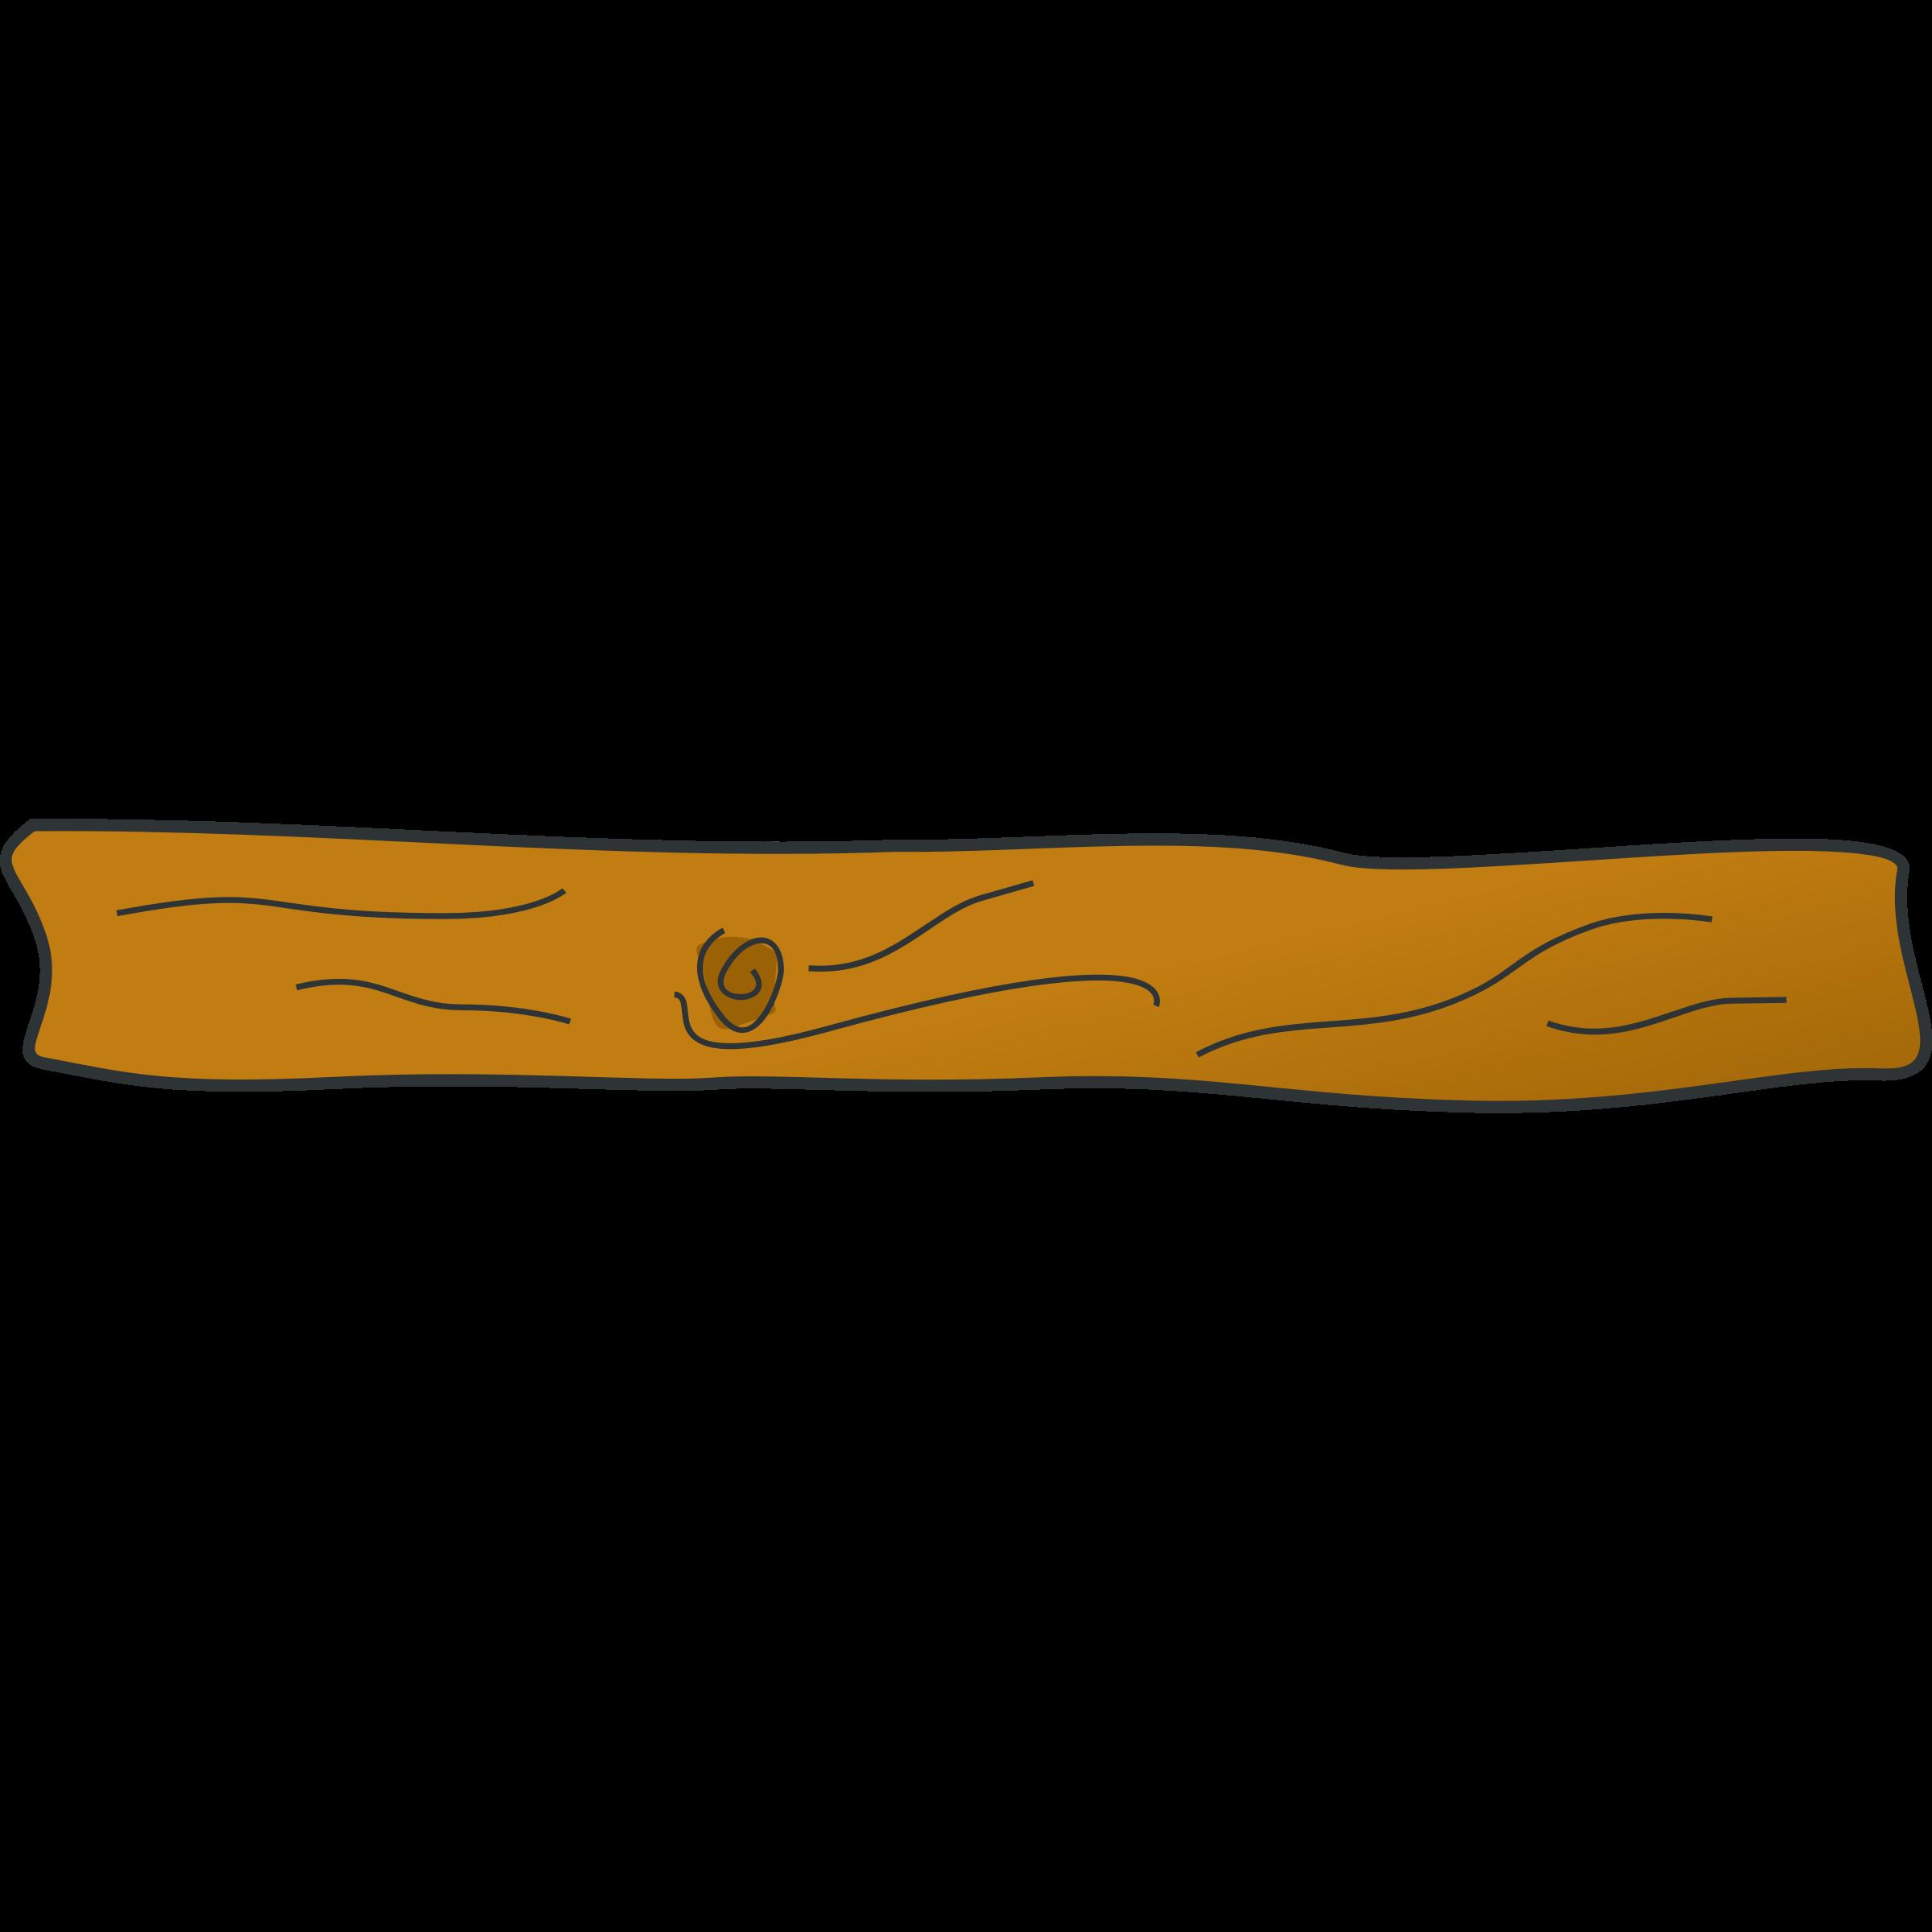 clip download Plank clipart. Free cliparts download clip.